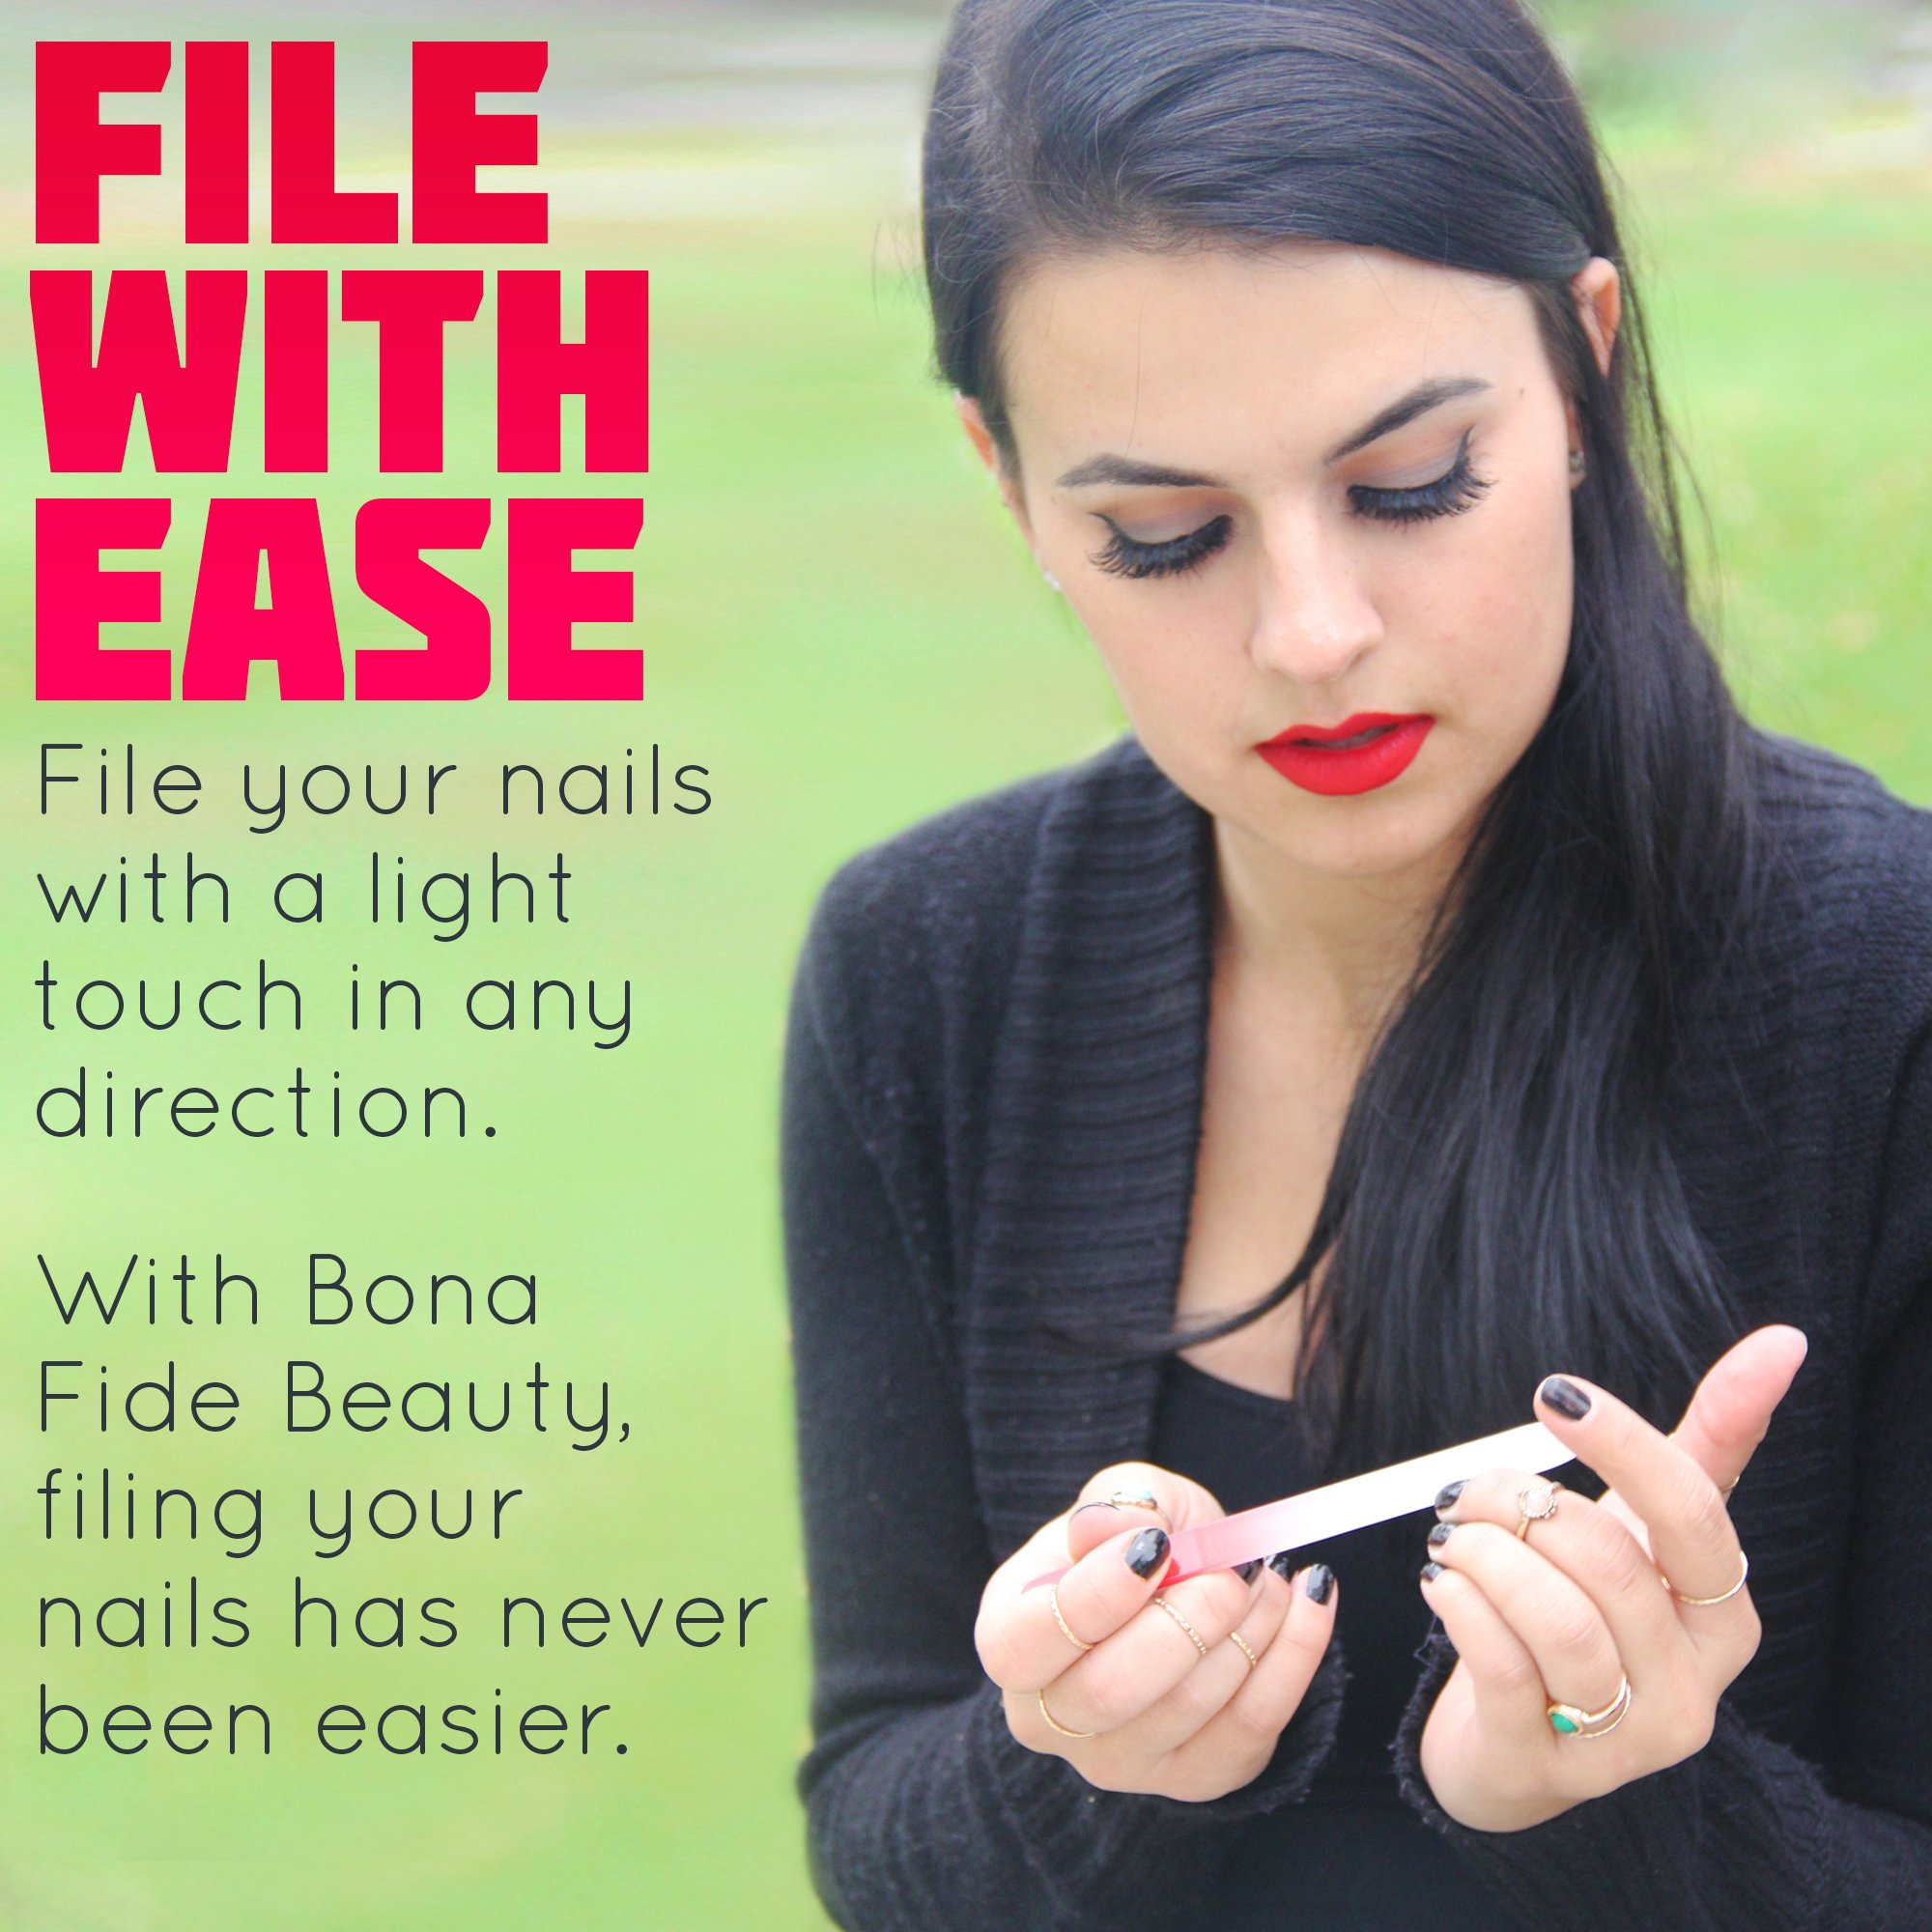 Glass Nail File Manicure Set, Fingernail File Nail Care, Manicure Tools by Bona Fide Beauty (5-Piece Set) Made in The Czech Republic by Bona Fide Beauty (Image #6)